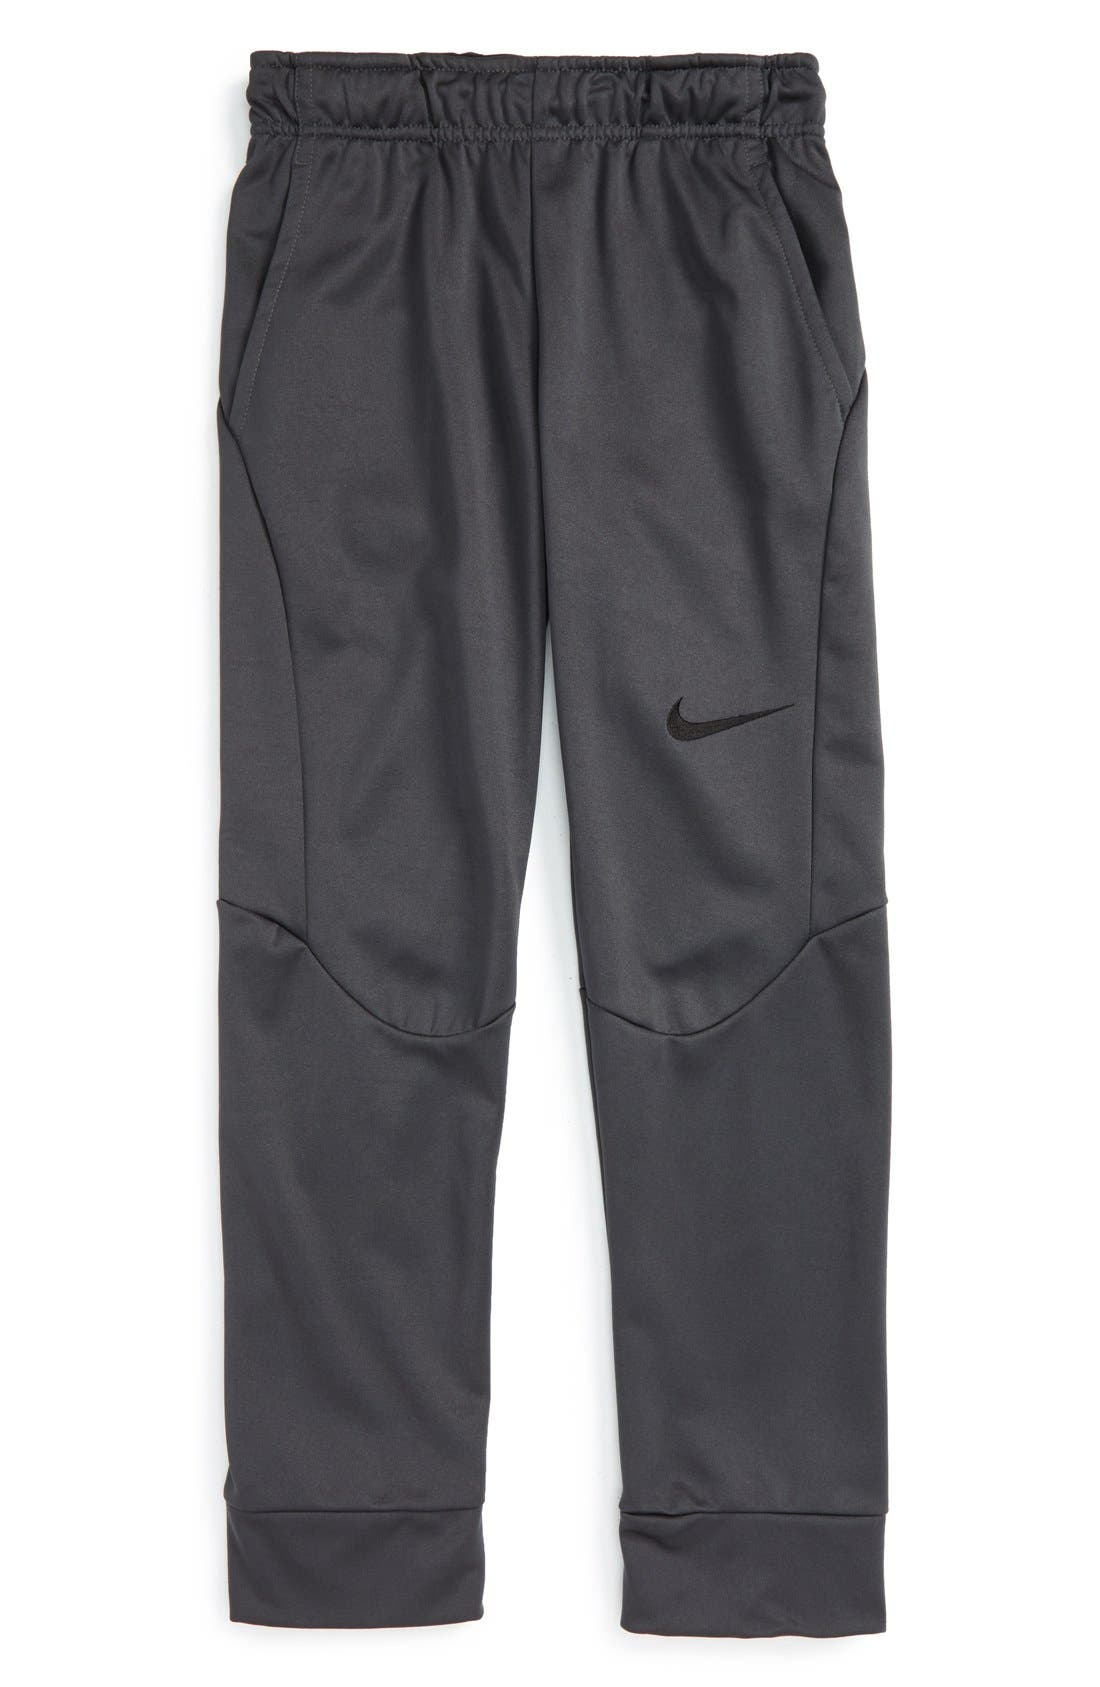 Alternate Image 1 Selected - Nike Therma-FIT Tapered Fleece Pants (Big Boys)